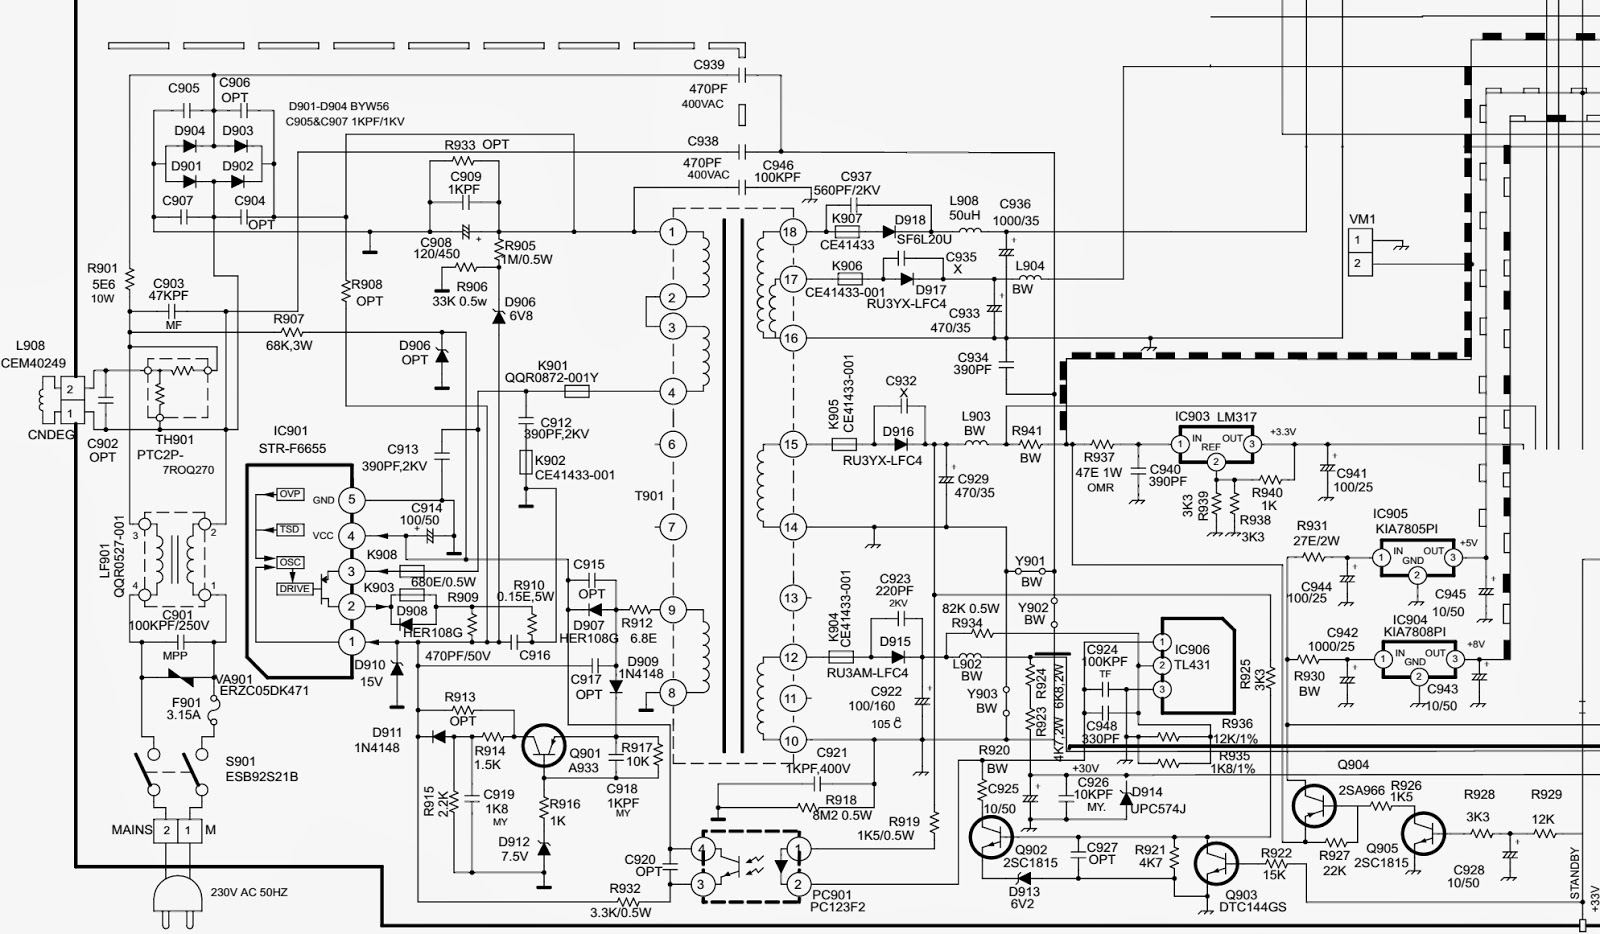 [DIAGRAM] Led Lcd Tv Circuit Diagram FULL Version HD Quality Circuit Diagram  AMYRIVERA